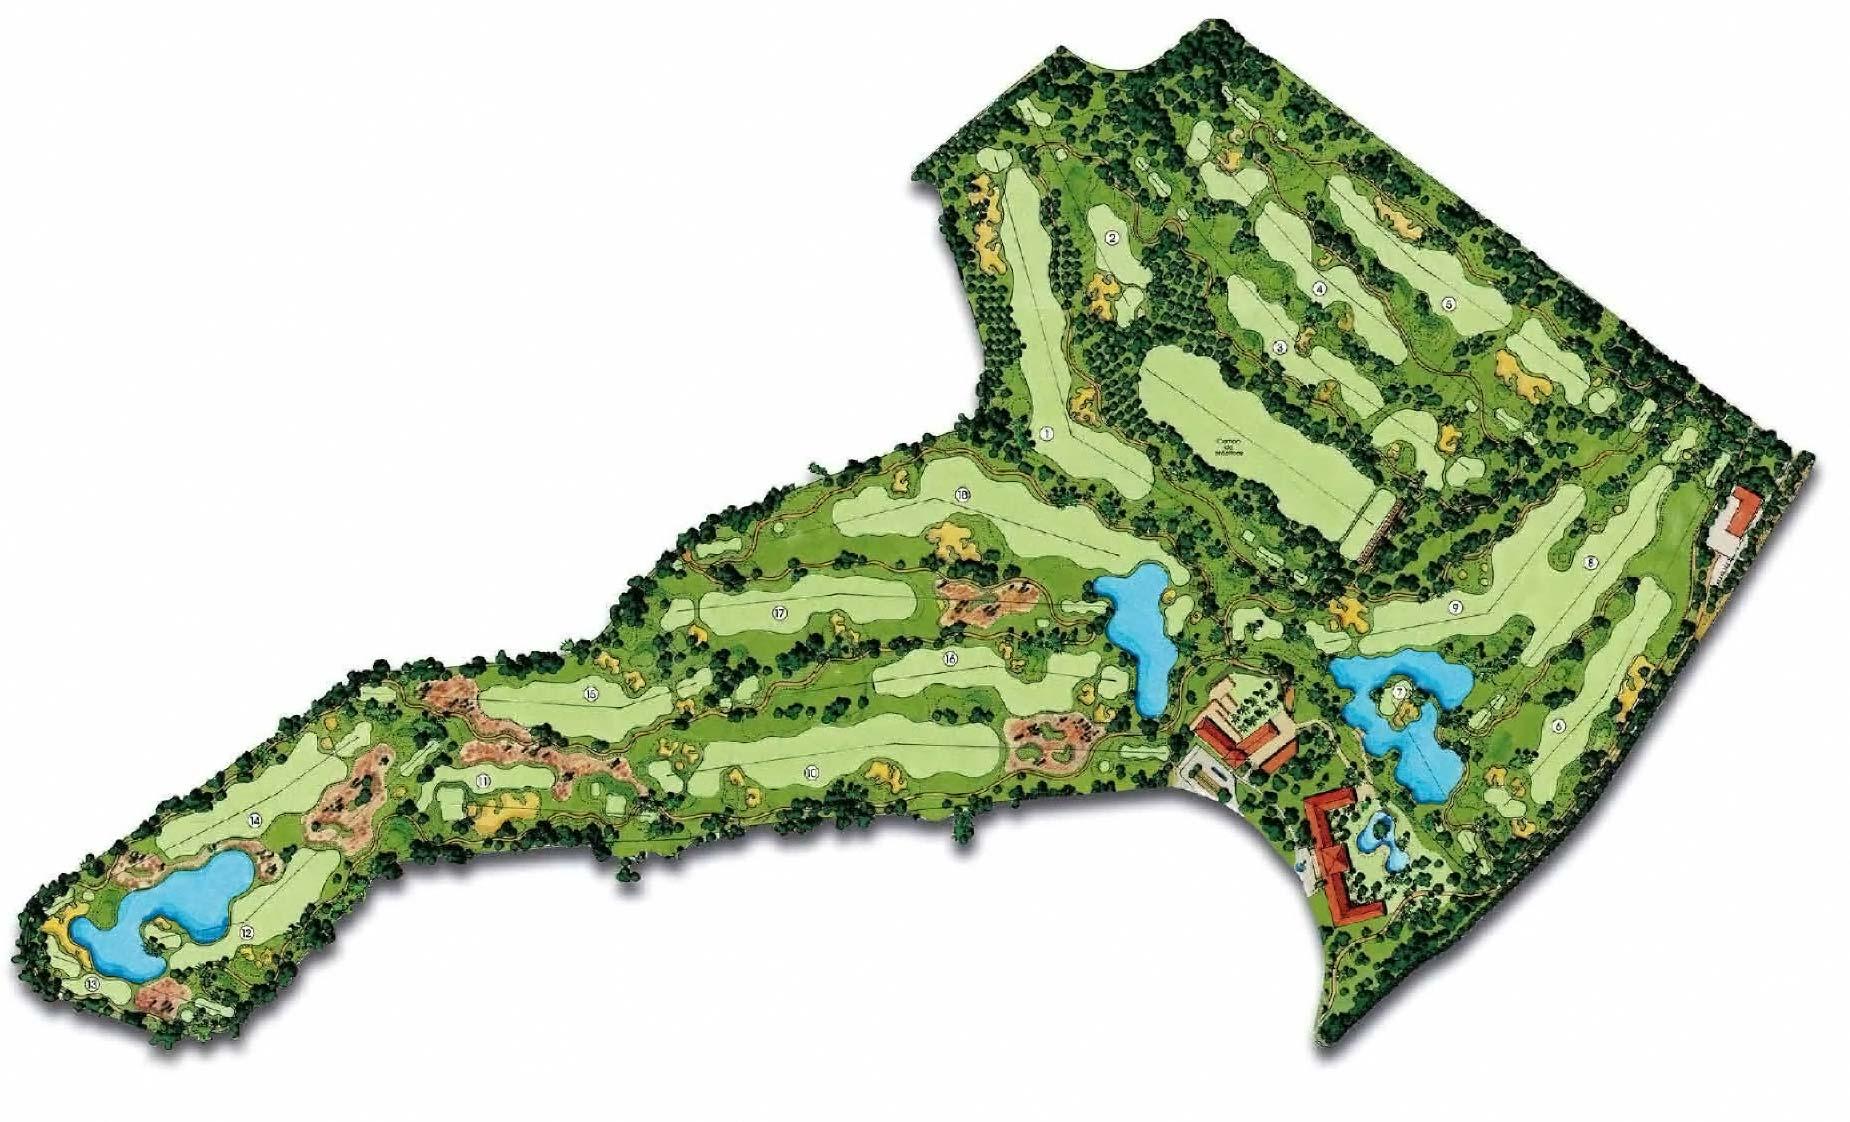 1850x1122 Top Golf Course Landscape Pencil Drawing